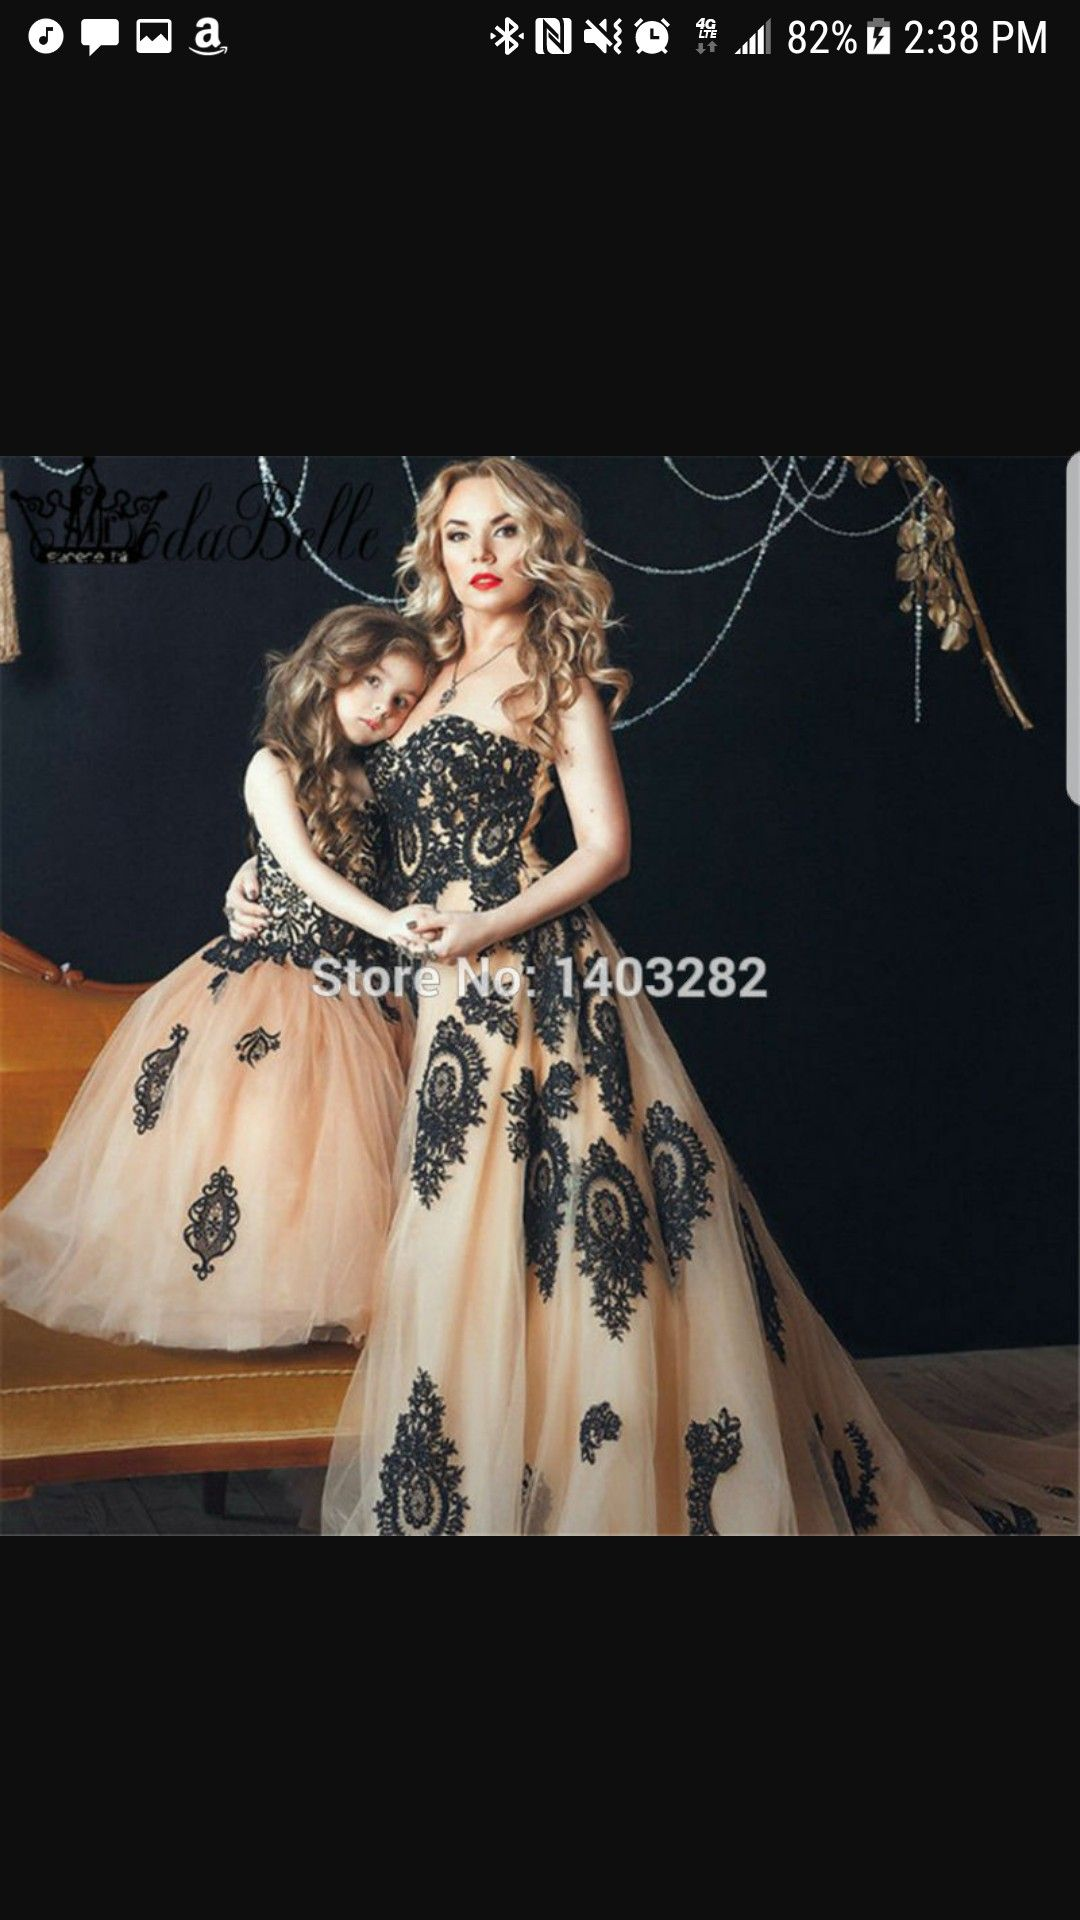 e16a7dd8e1 Formal Evening Dresses, Evening Gowns, Lace Party Dresses, Bridal Dresses,  Wedding Gowns